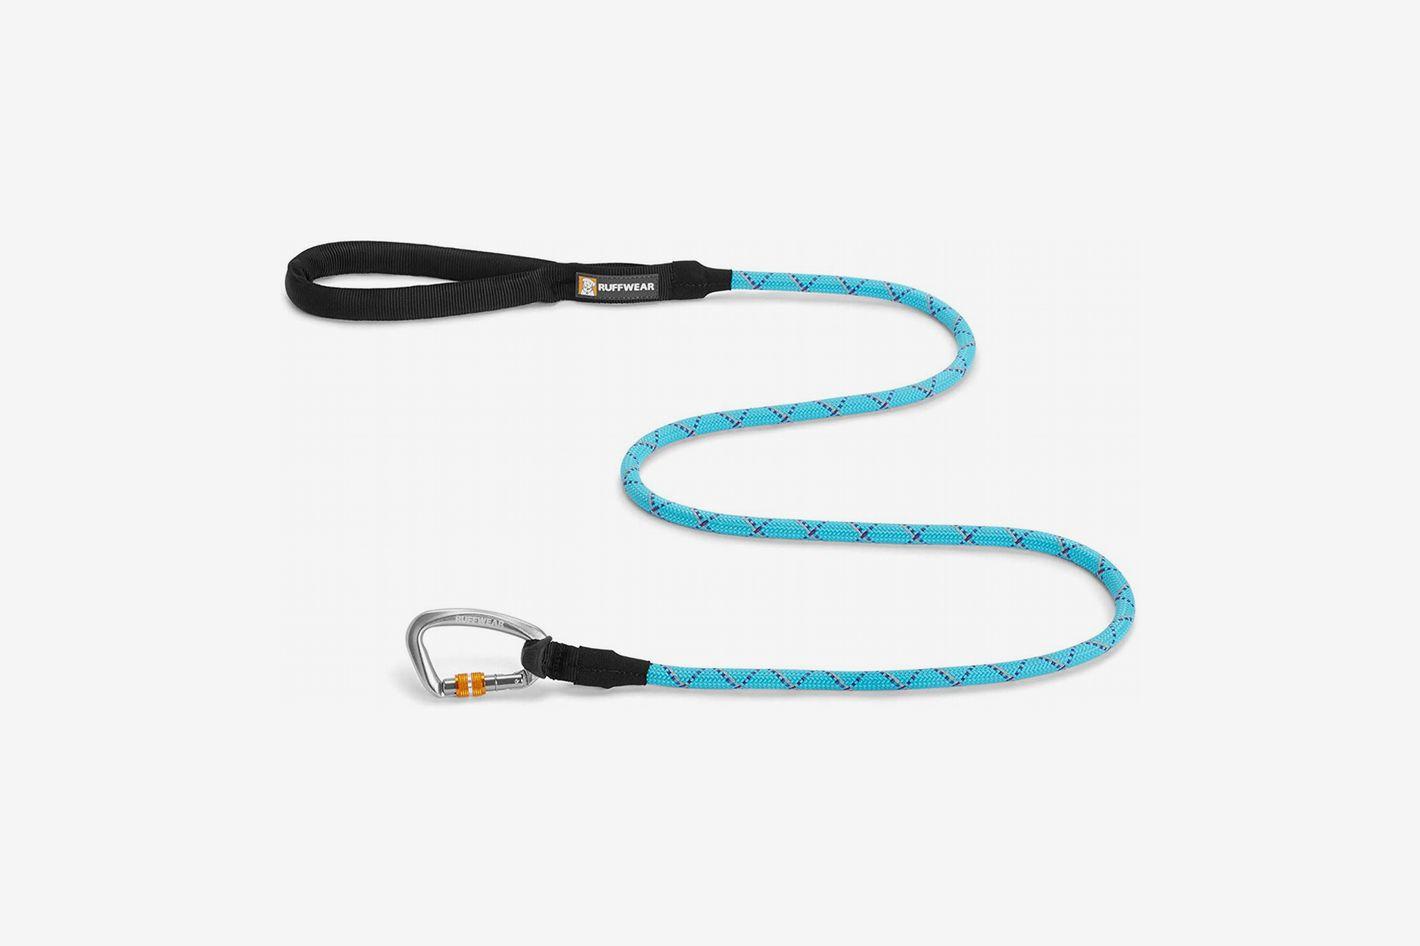 Ruffwear Knot-a-Leash Reflective Dog Leash with Secure Locking Carabiner